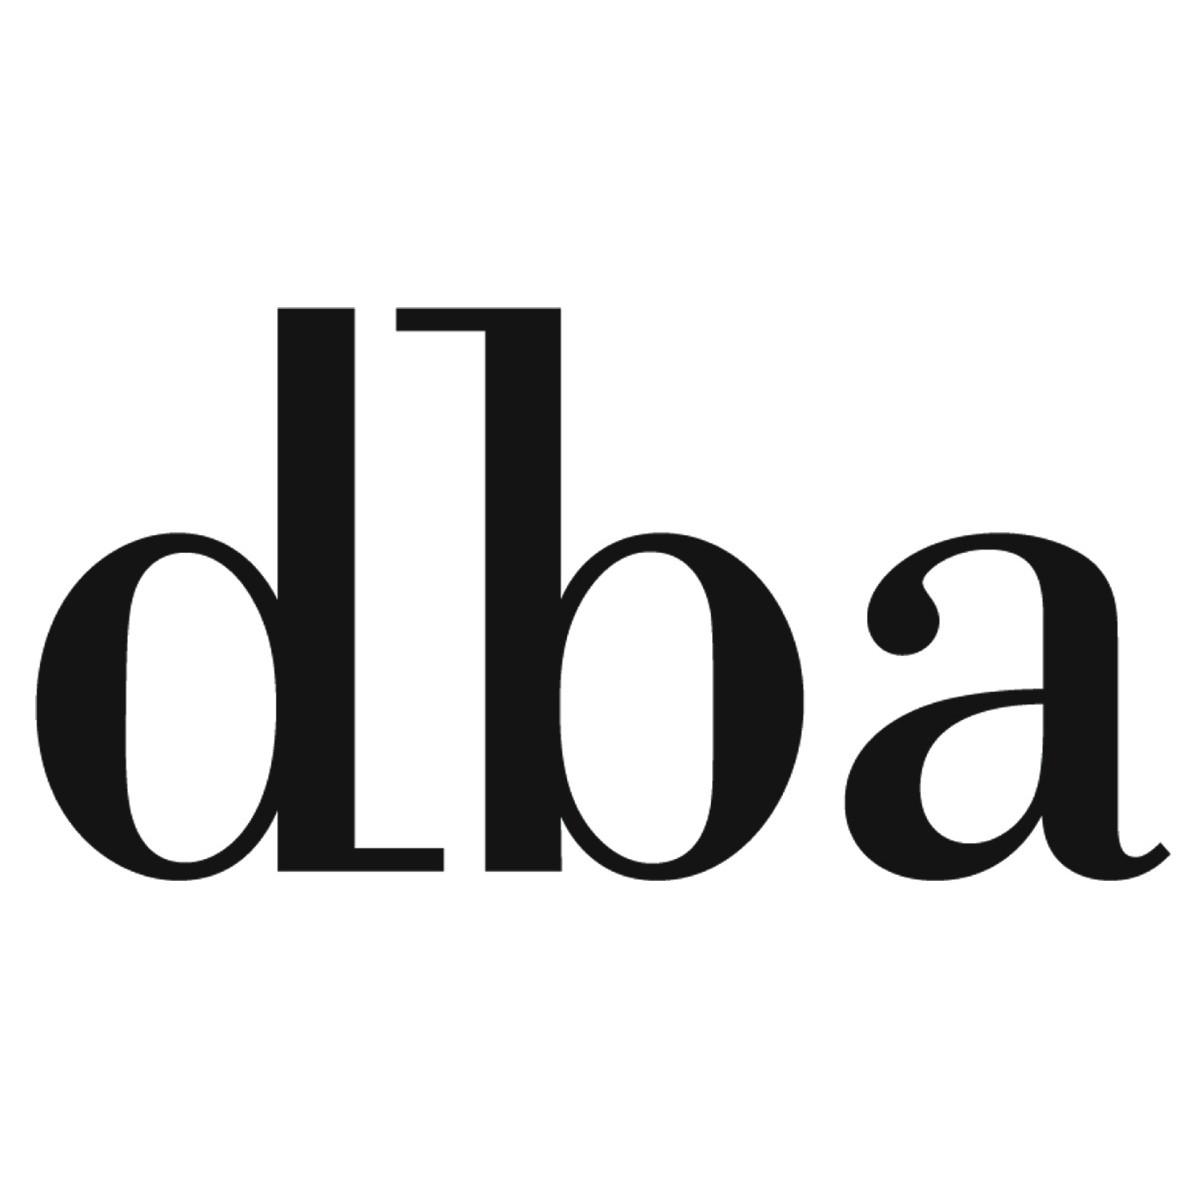 dba-logo-2 copy.jpg